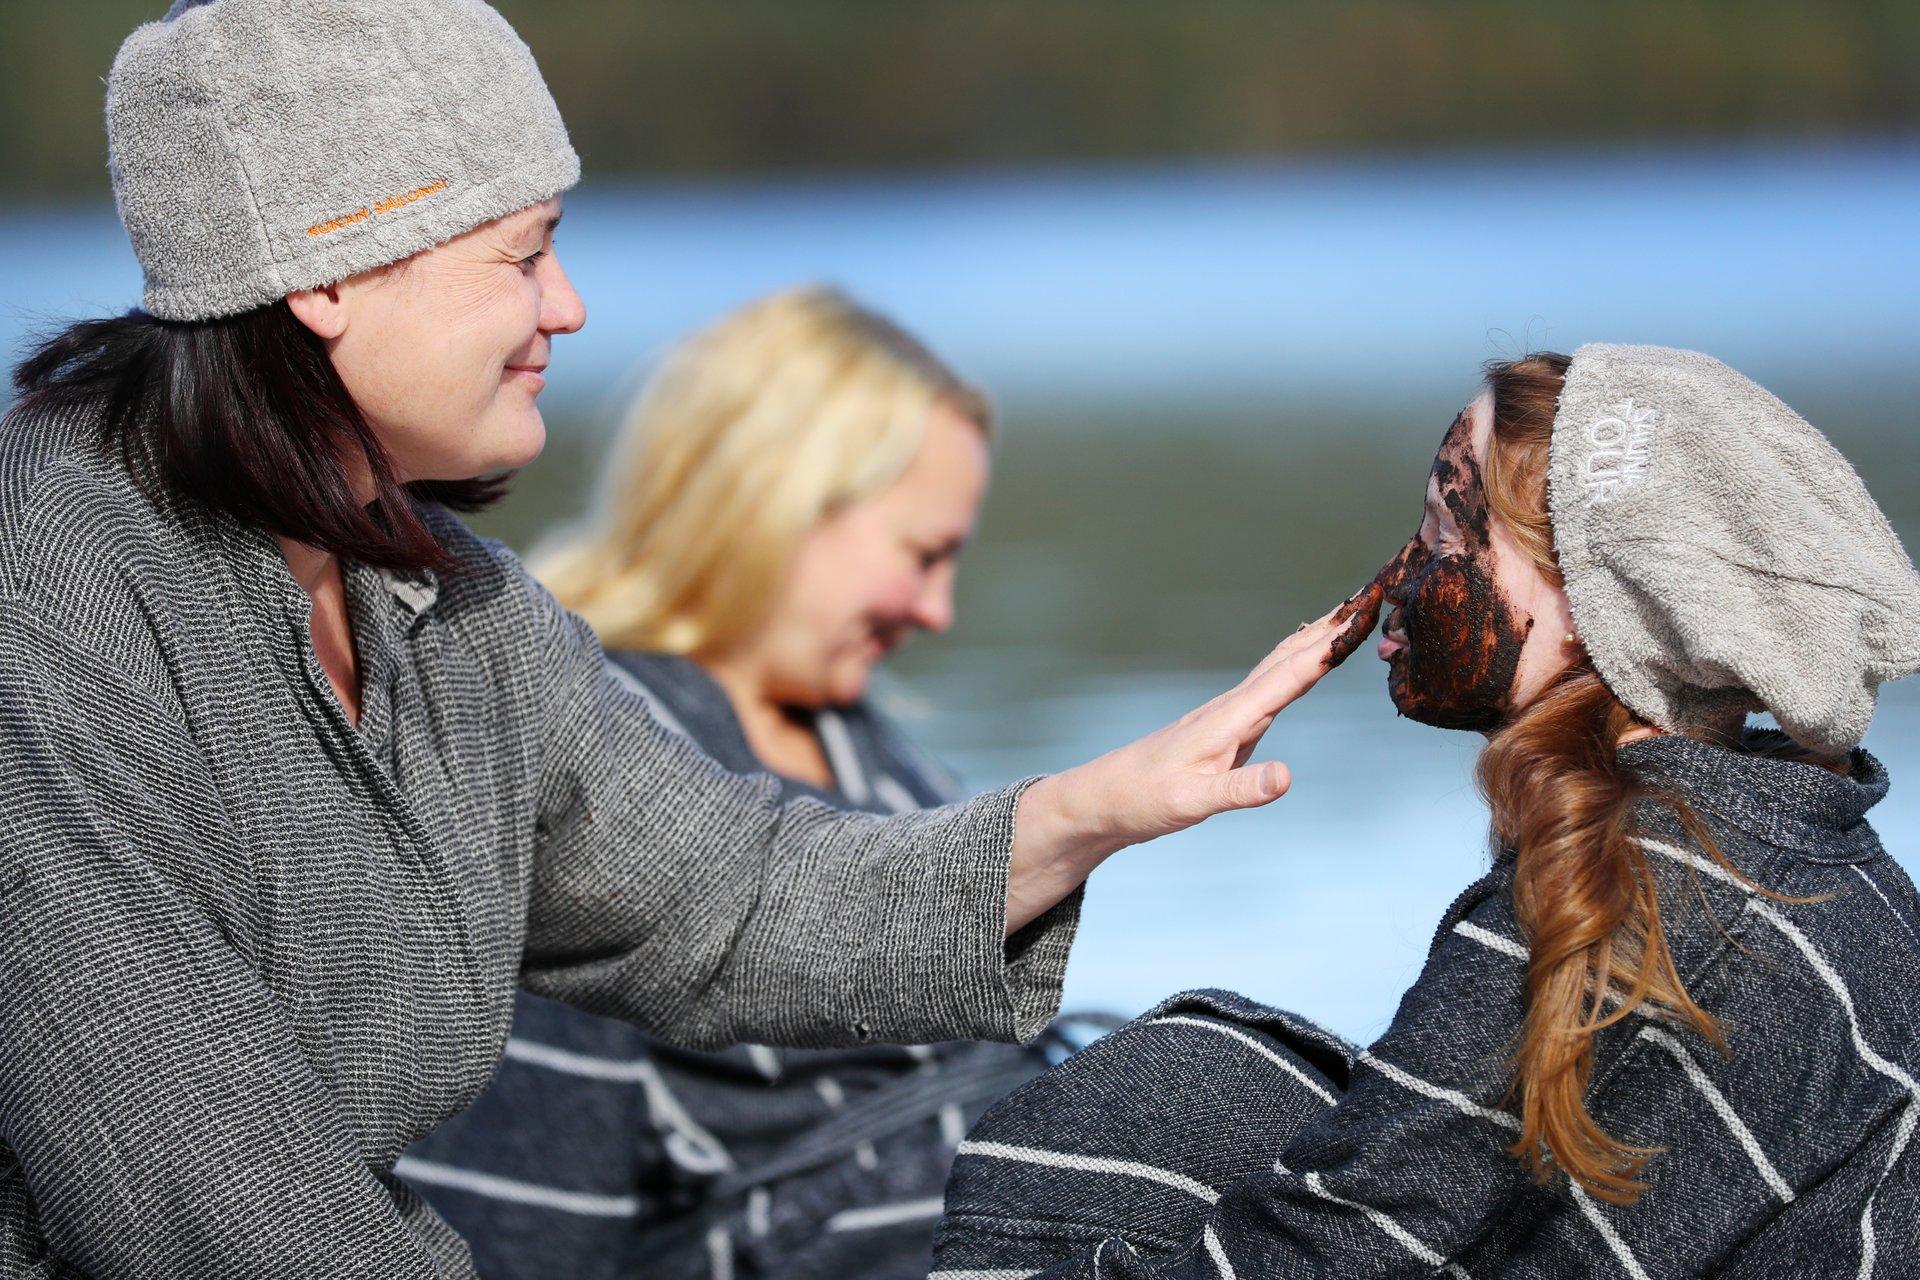 Kuusamo Folk Healers' Gathering in Finland 2020 - Best Time